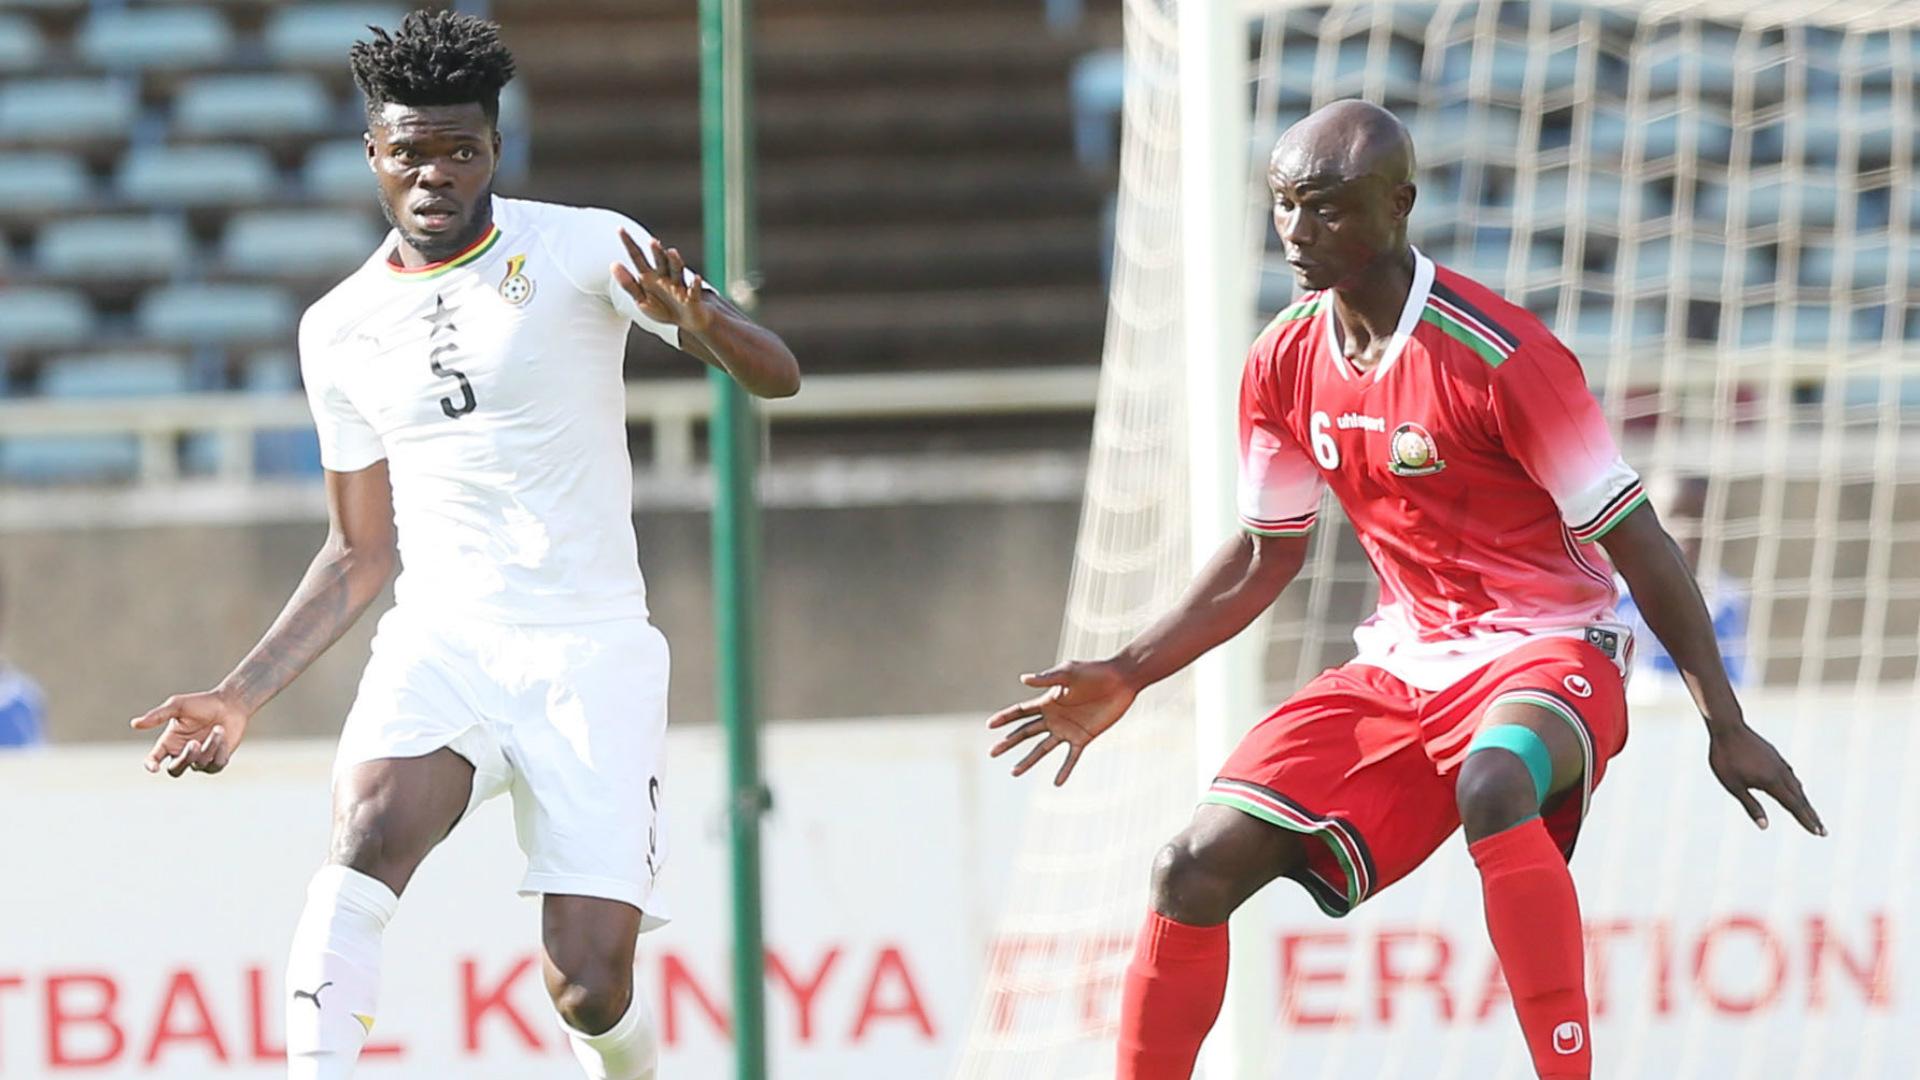 cc1e9ac7affef6 Dennis Odhiambo of Sofapaka and Kenya v Thomas Partey of Ghana.